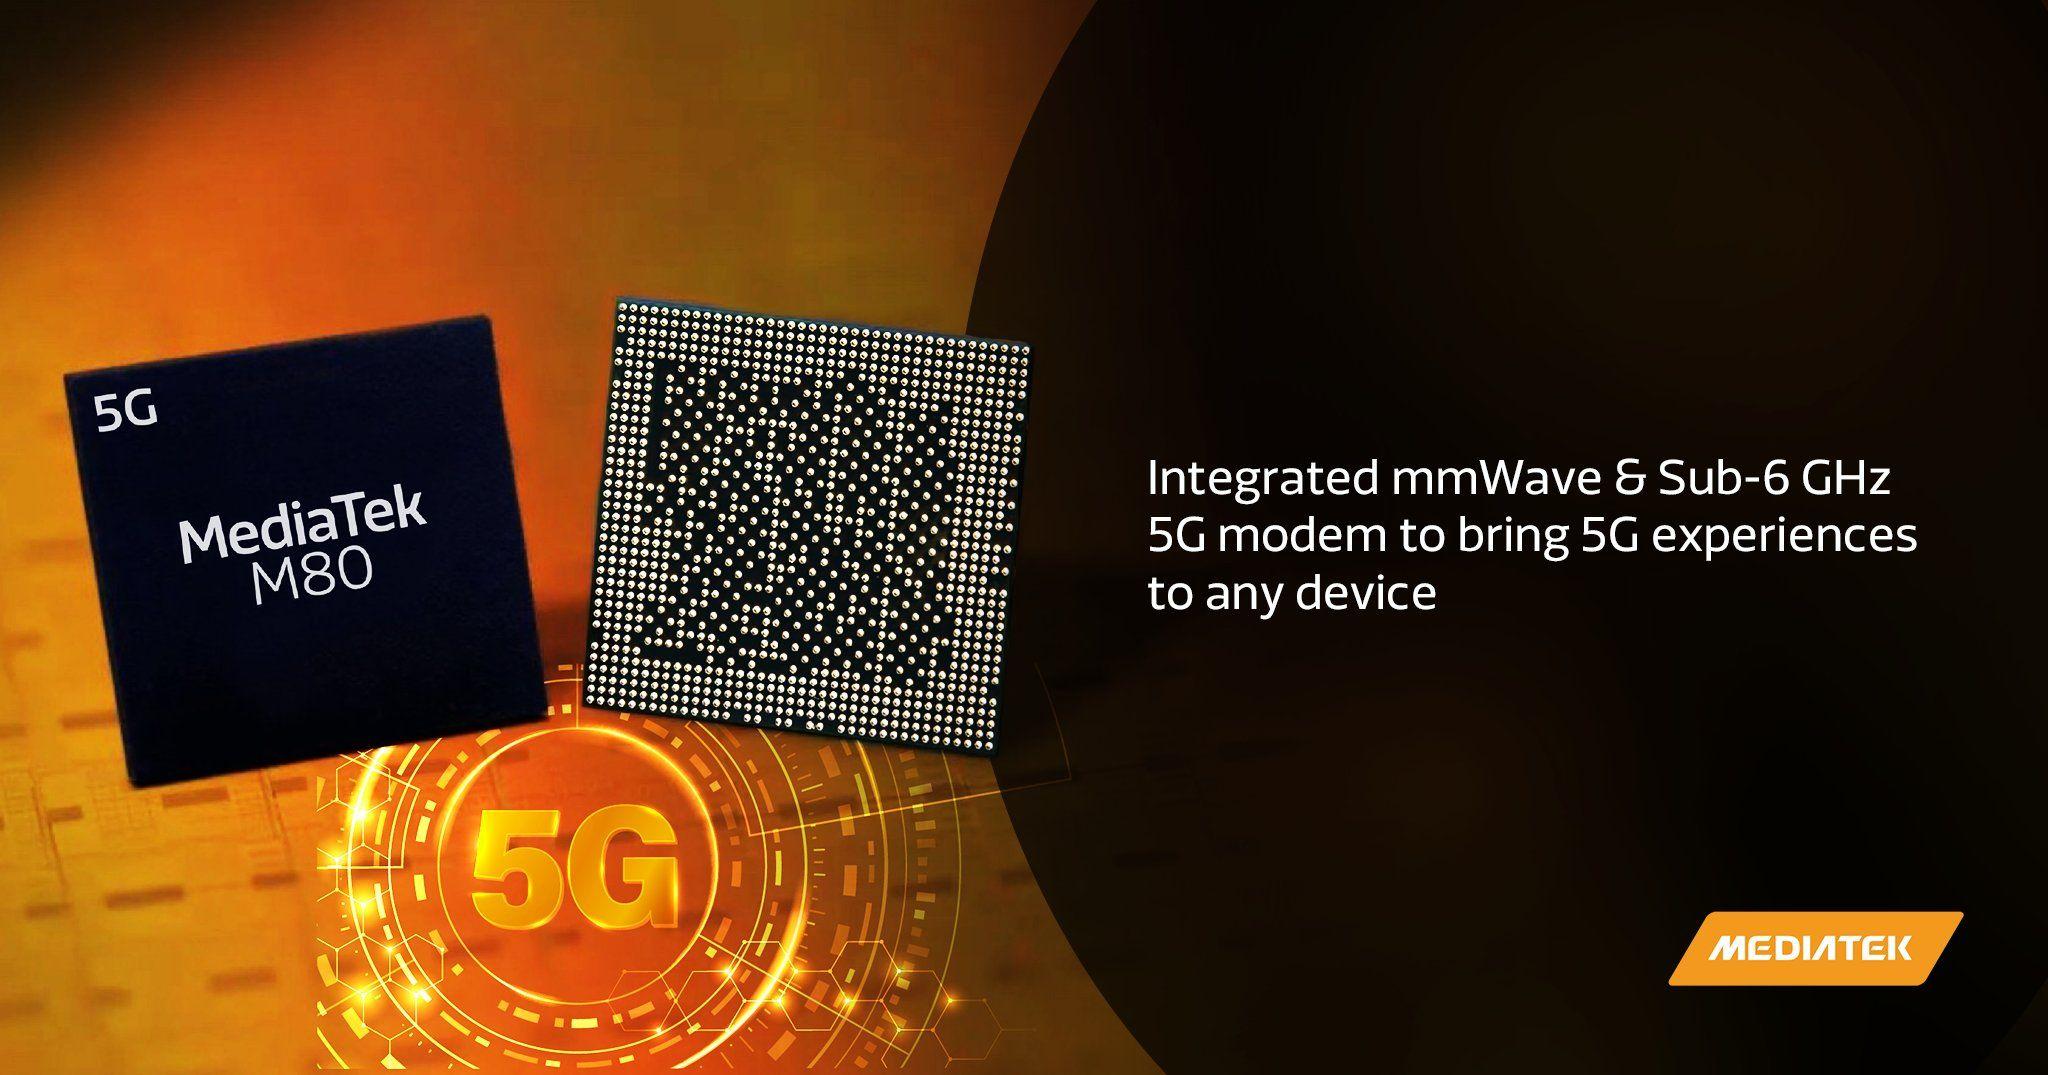 MediaTek M80を発表、Sub-6GHz+mmWave対応5Gモデム